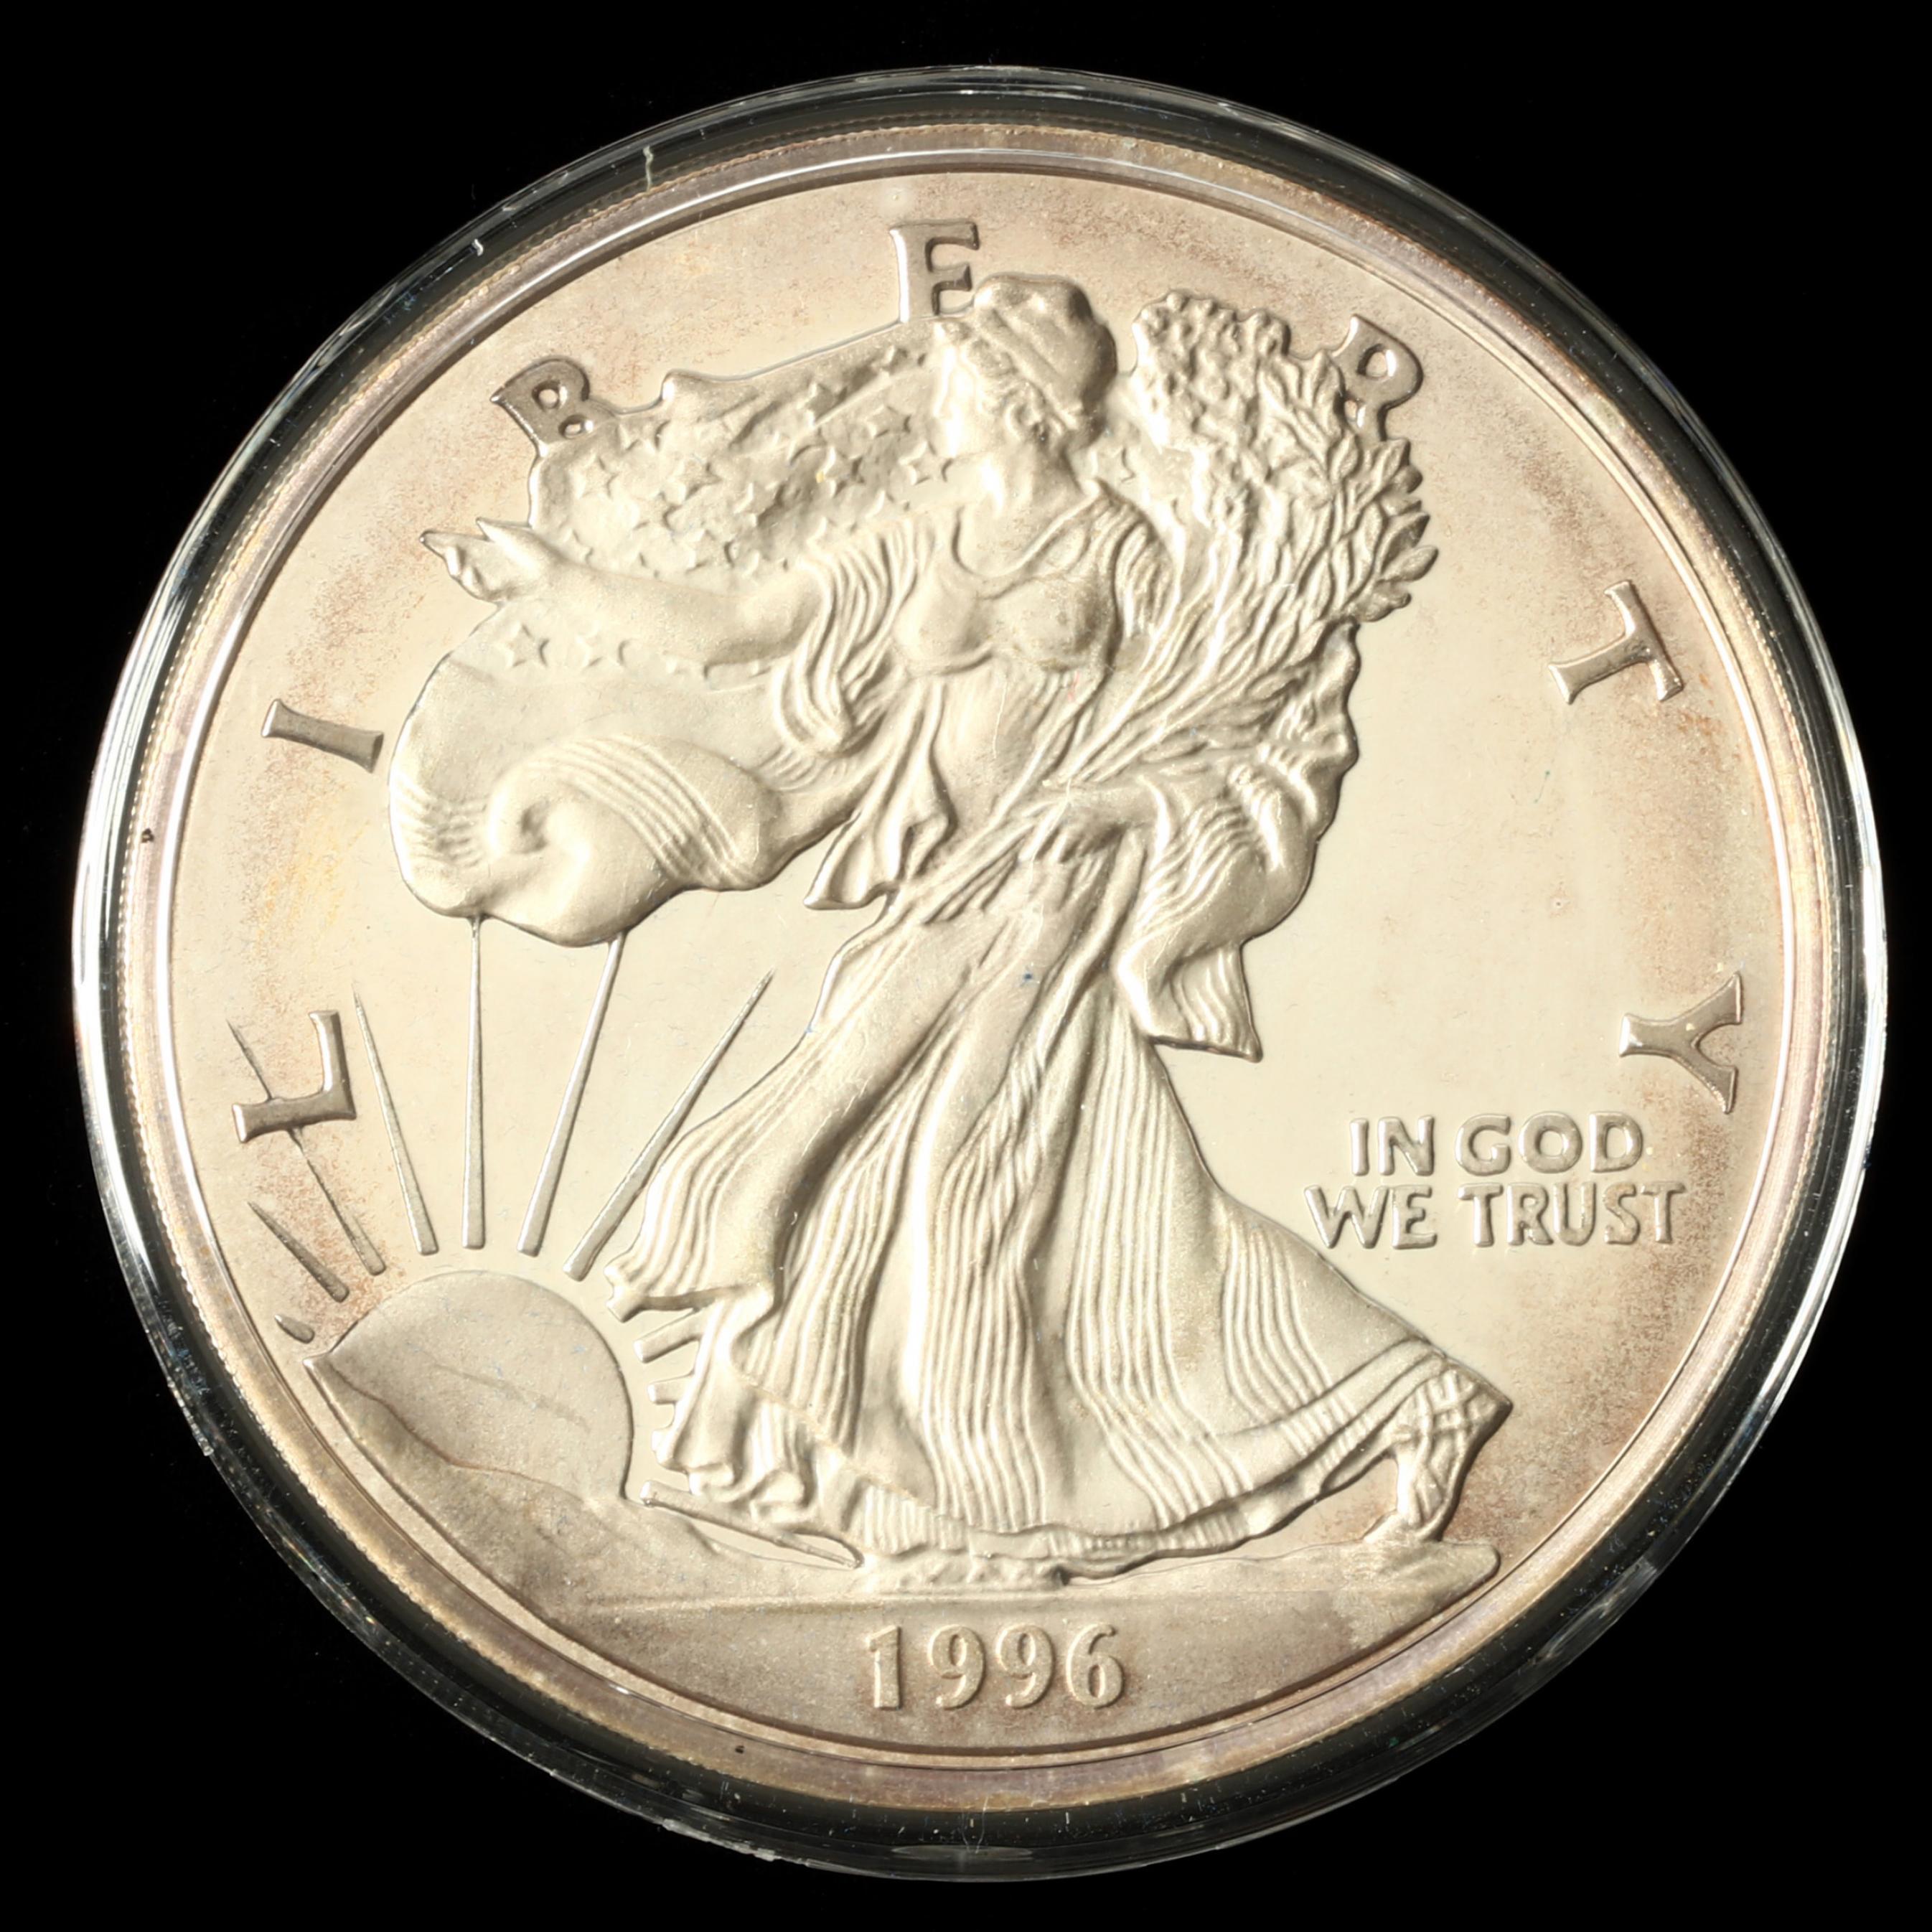 1996-washington-mint-half-pound-proof-silver-round